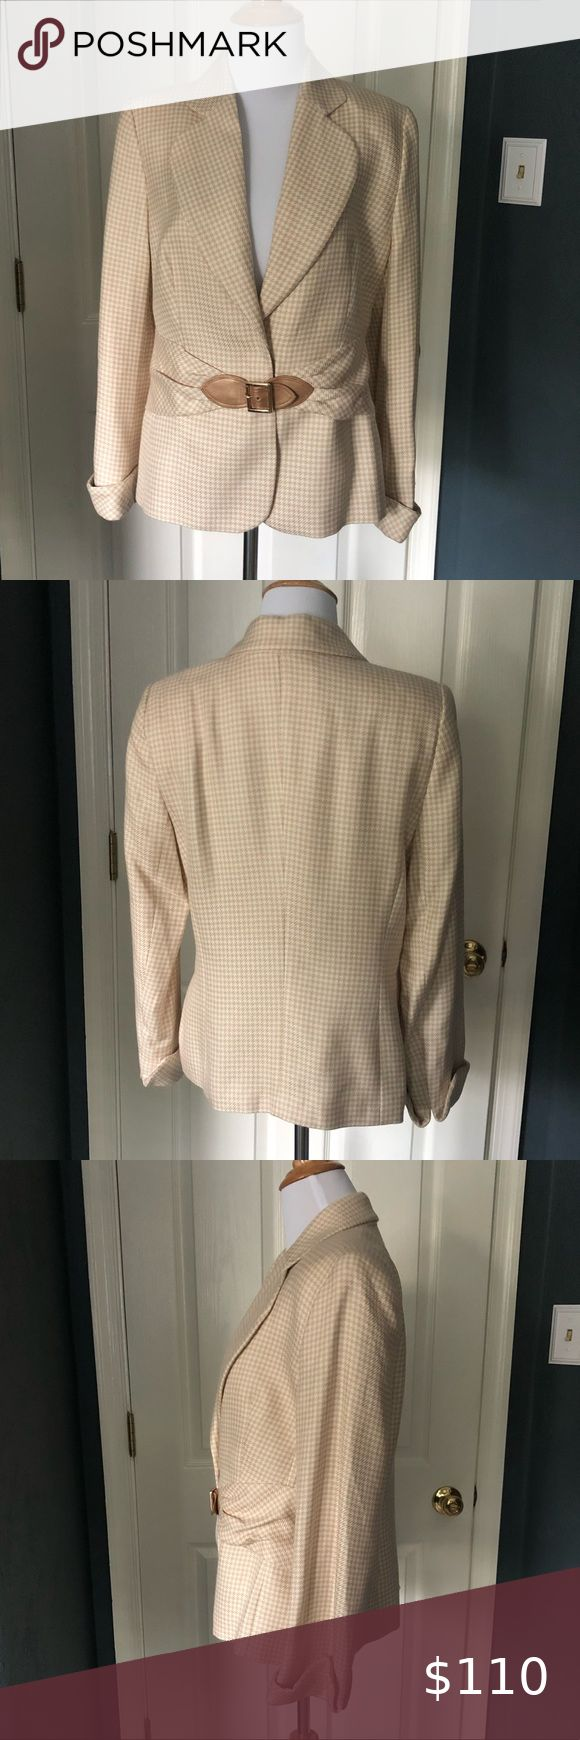 Escada Cream And Tan Houndstooth Blazer In 2021 Houndstooth Blazer Escada Jacket Clothes Design